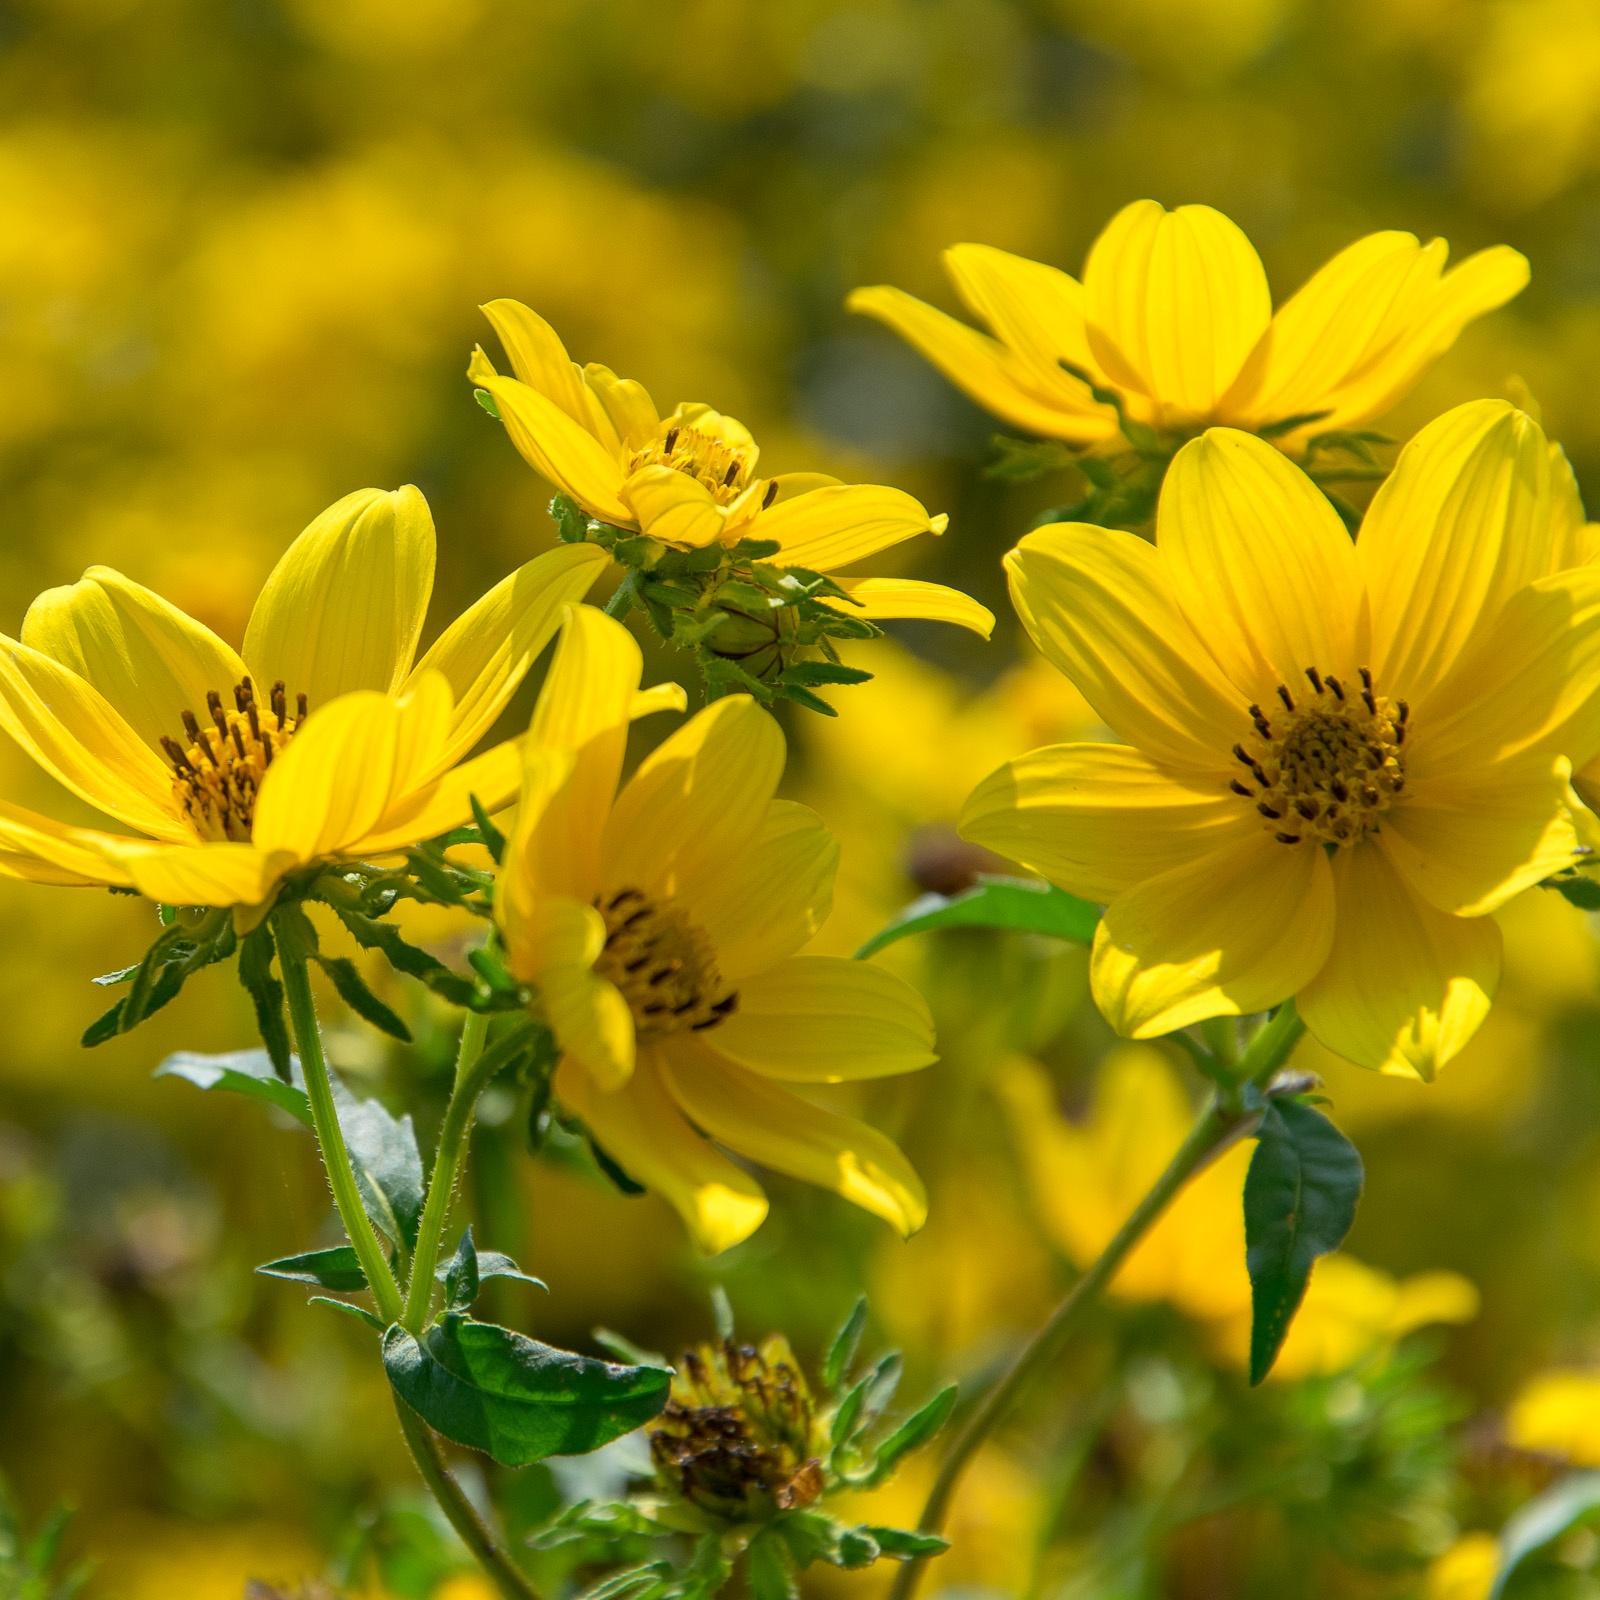 Bur Marigold closeup